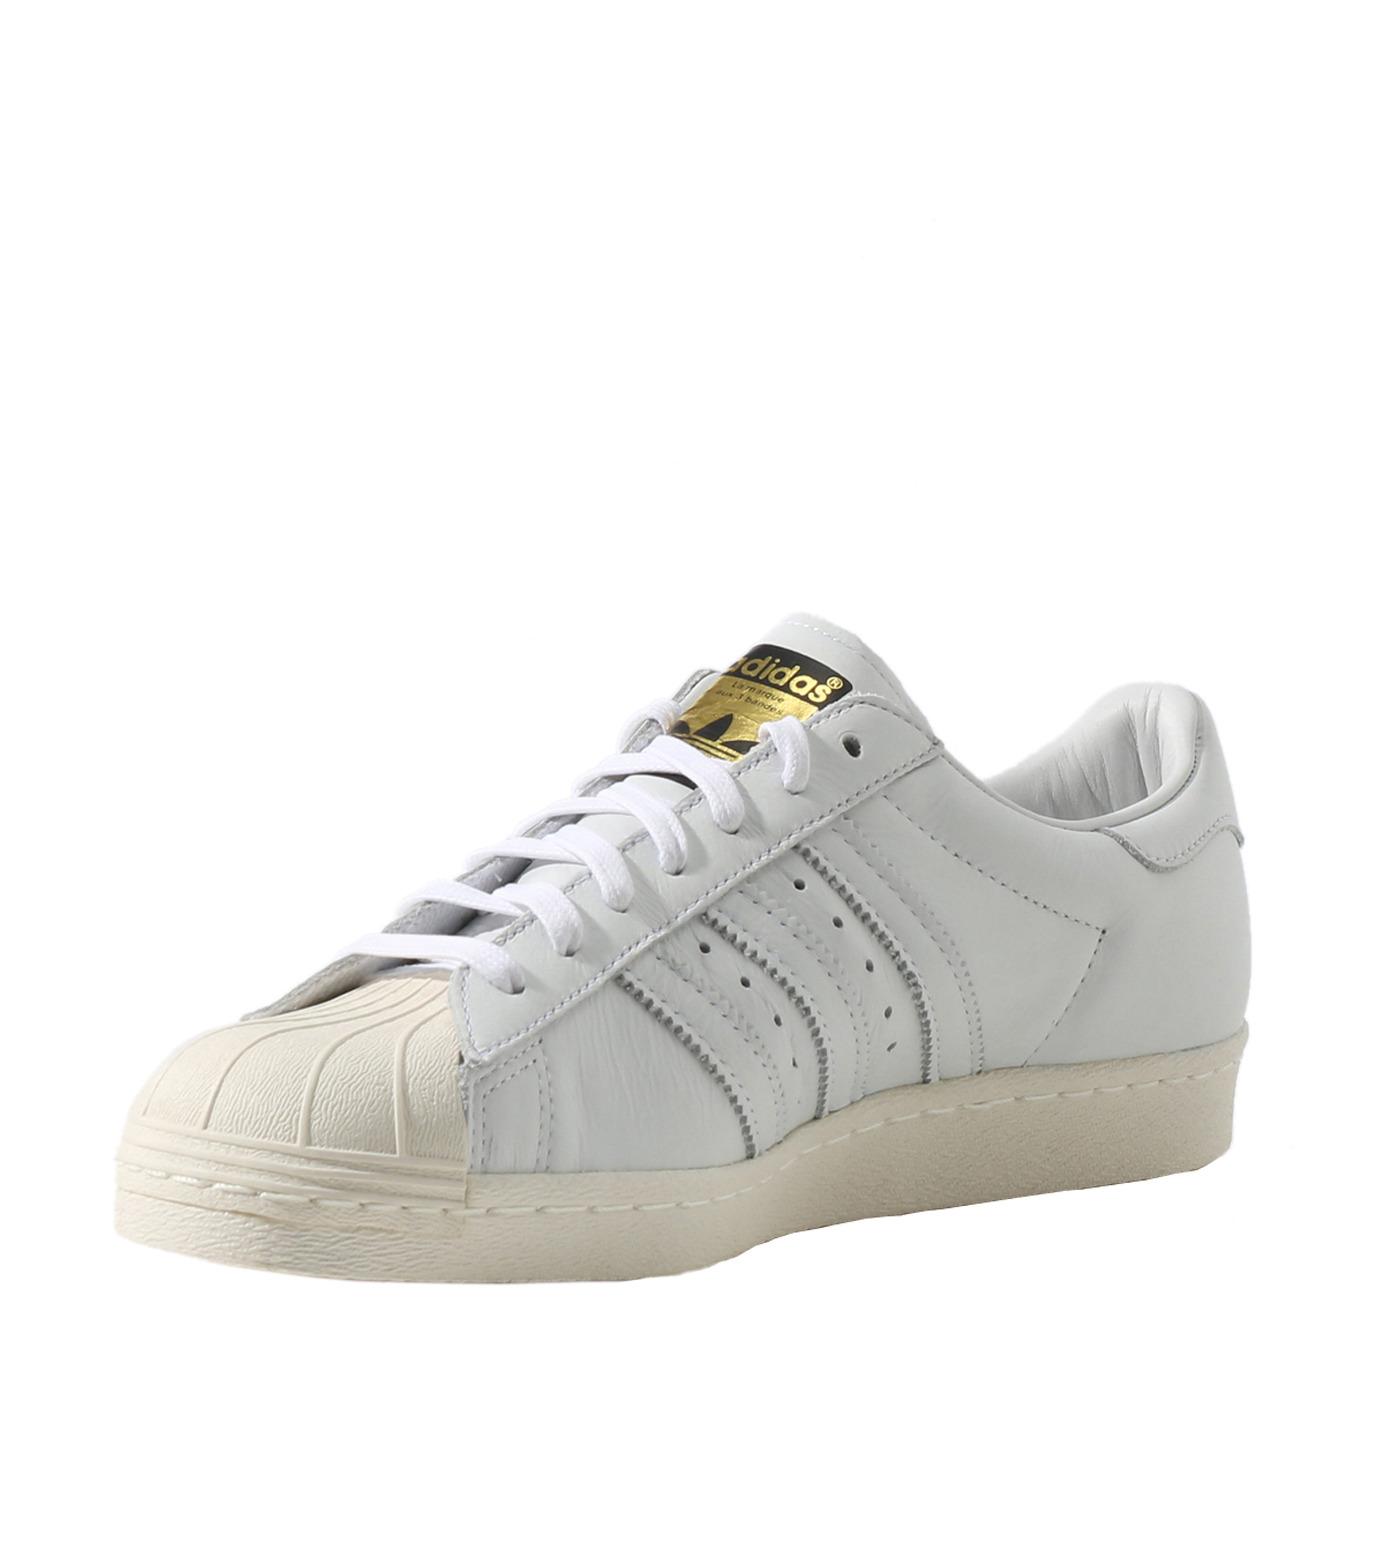 adidas(アディダス)のSUPERSTAR 80s DLX-WHITE(シューズ/shoes)-S75016-4 拡大詳細画像3